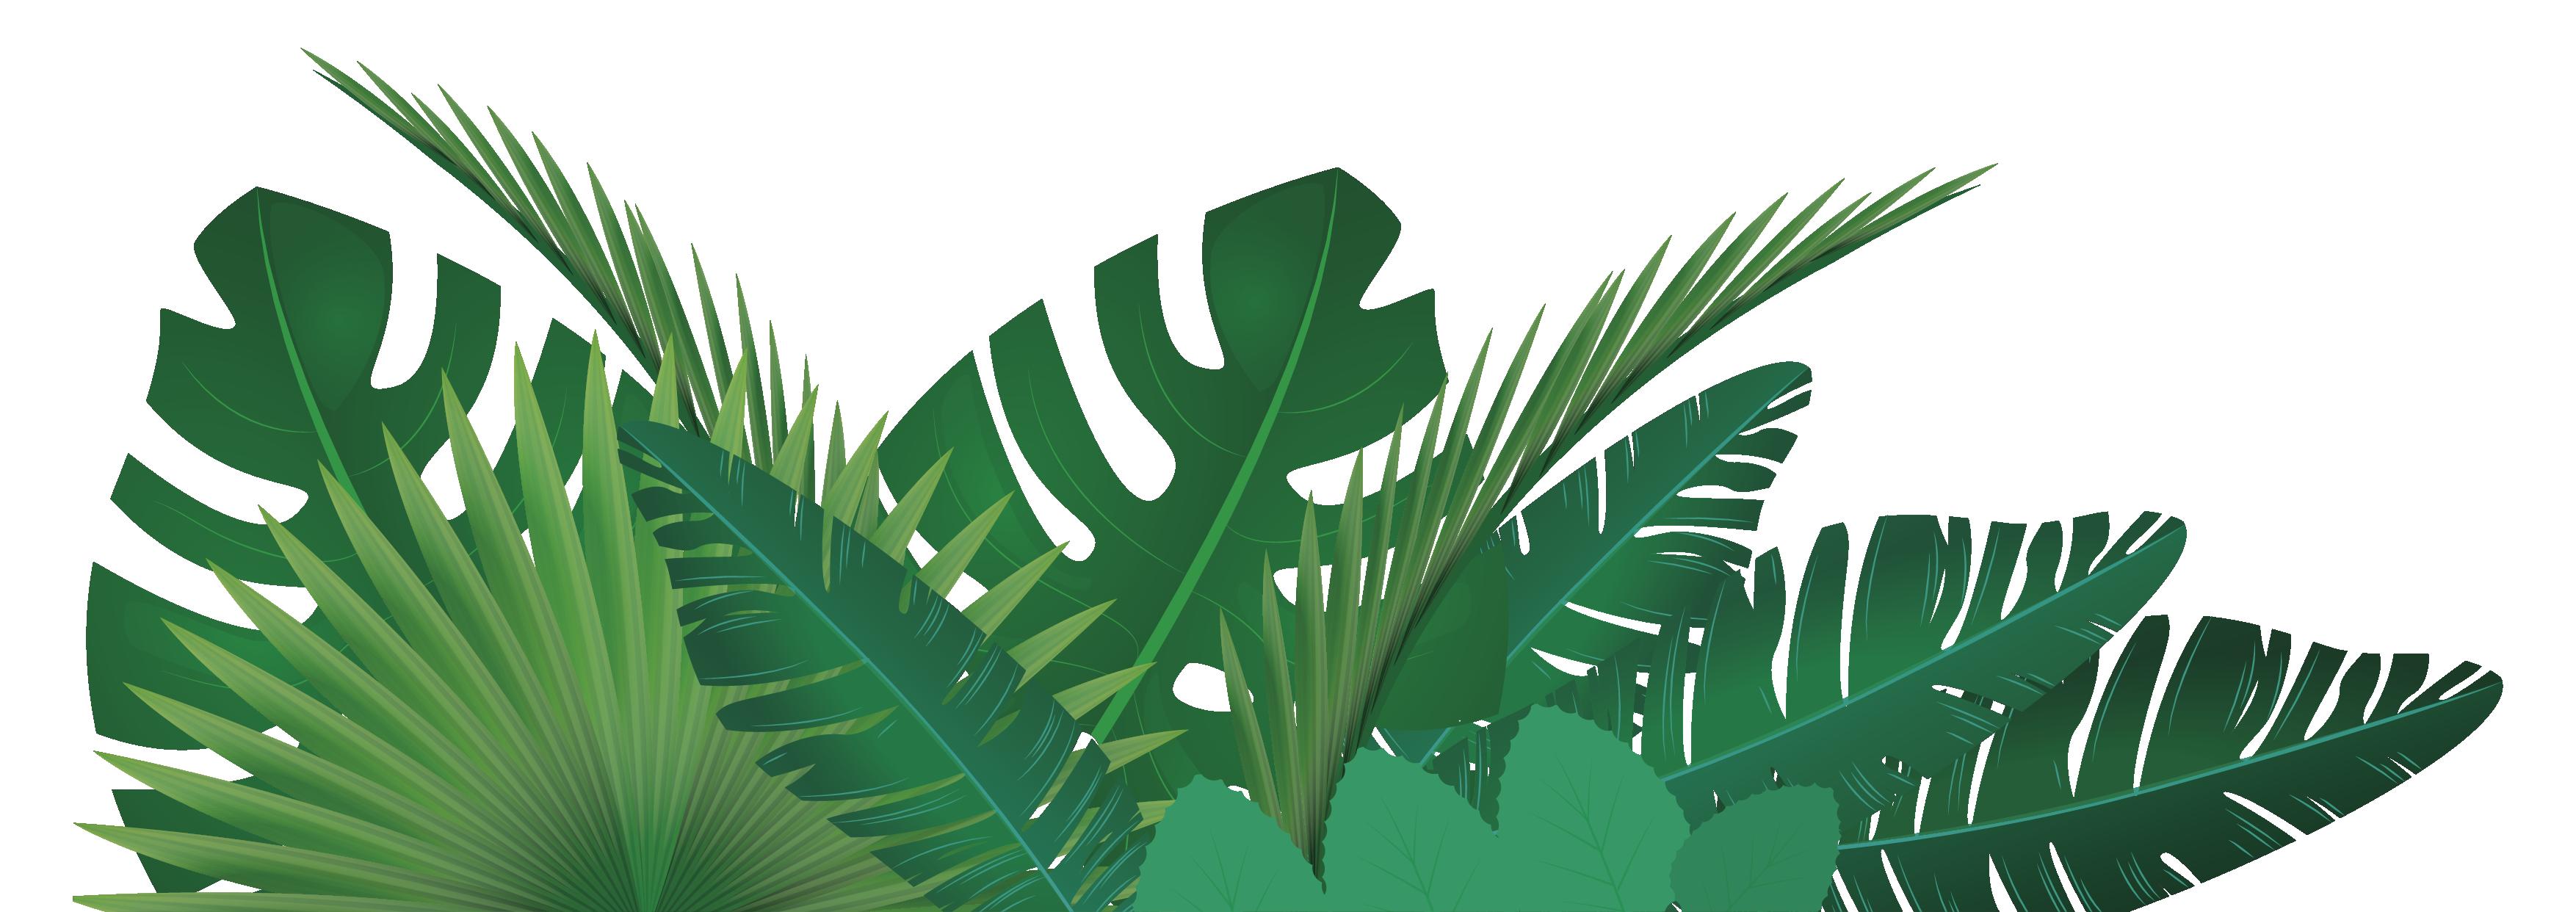 visuel-plantes-01